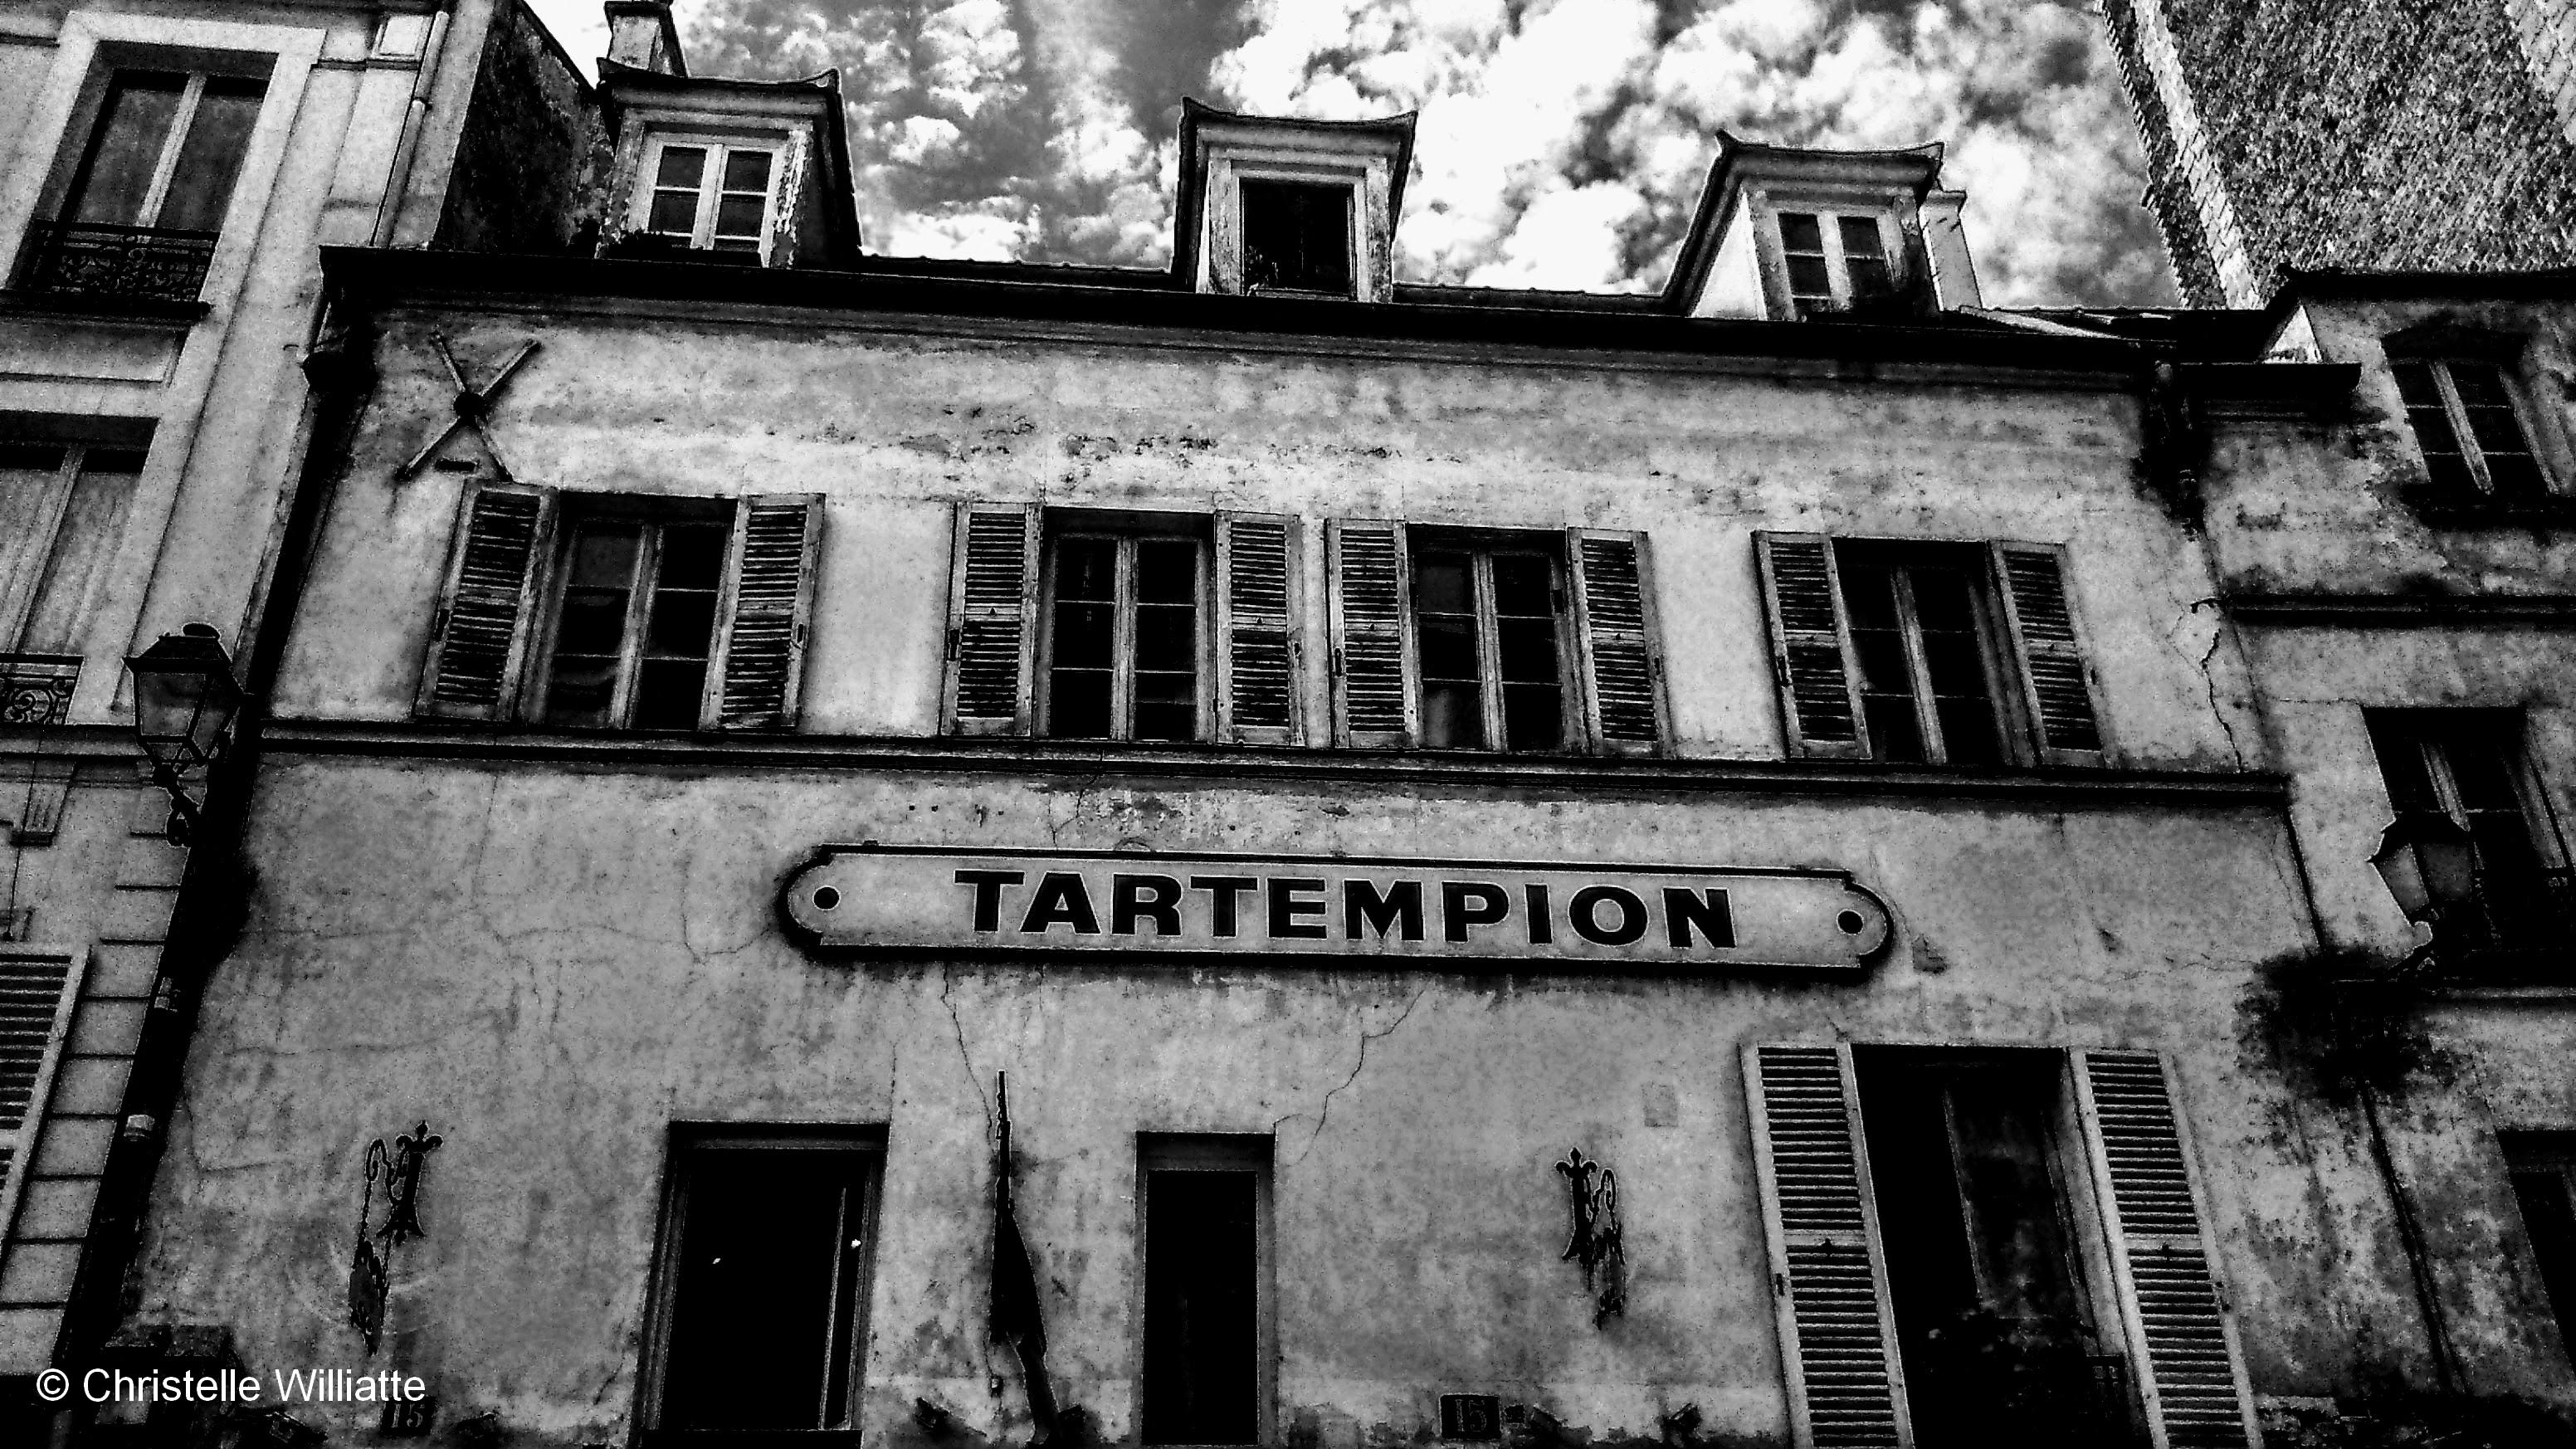 Tartempion